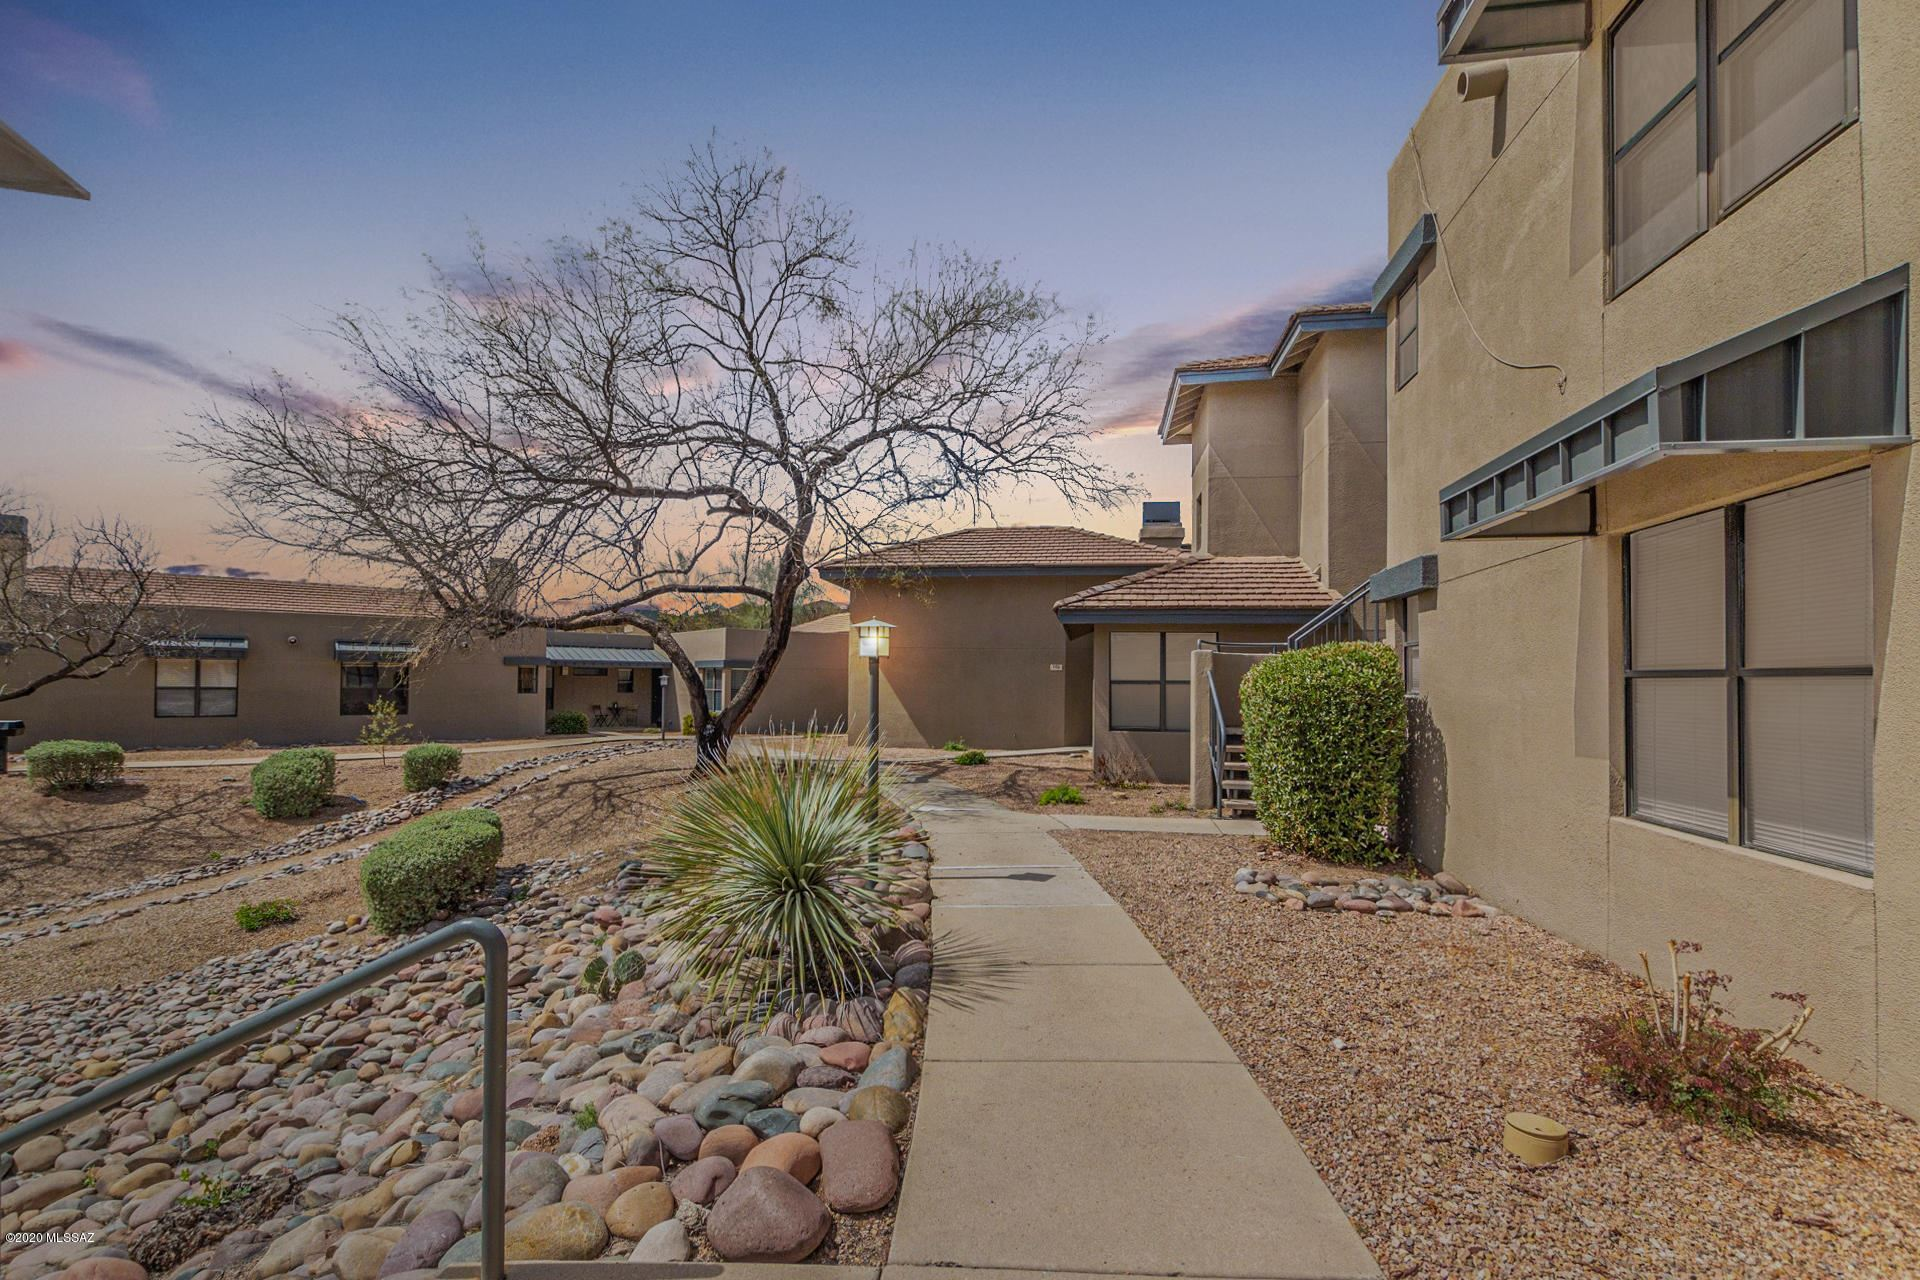 5800 N Kolb Road #1205, Tucson, AZ 85750 - MLS#: 22007872